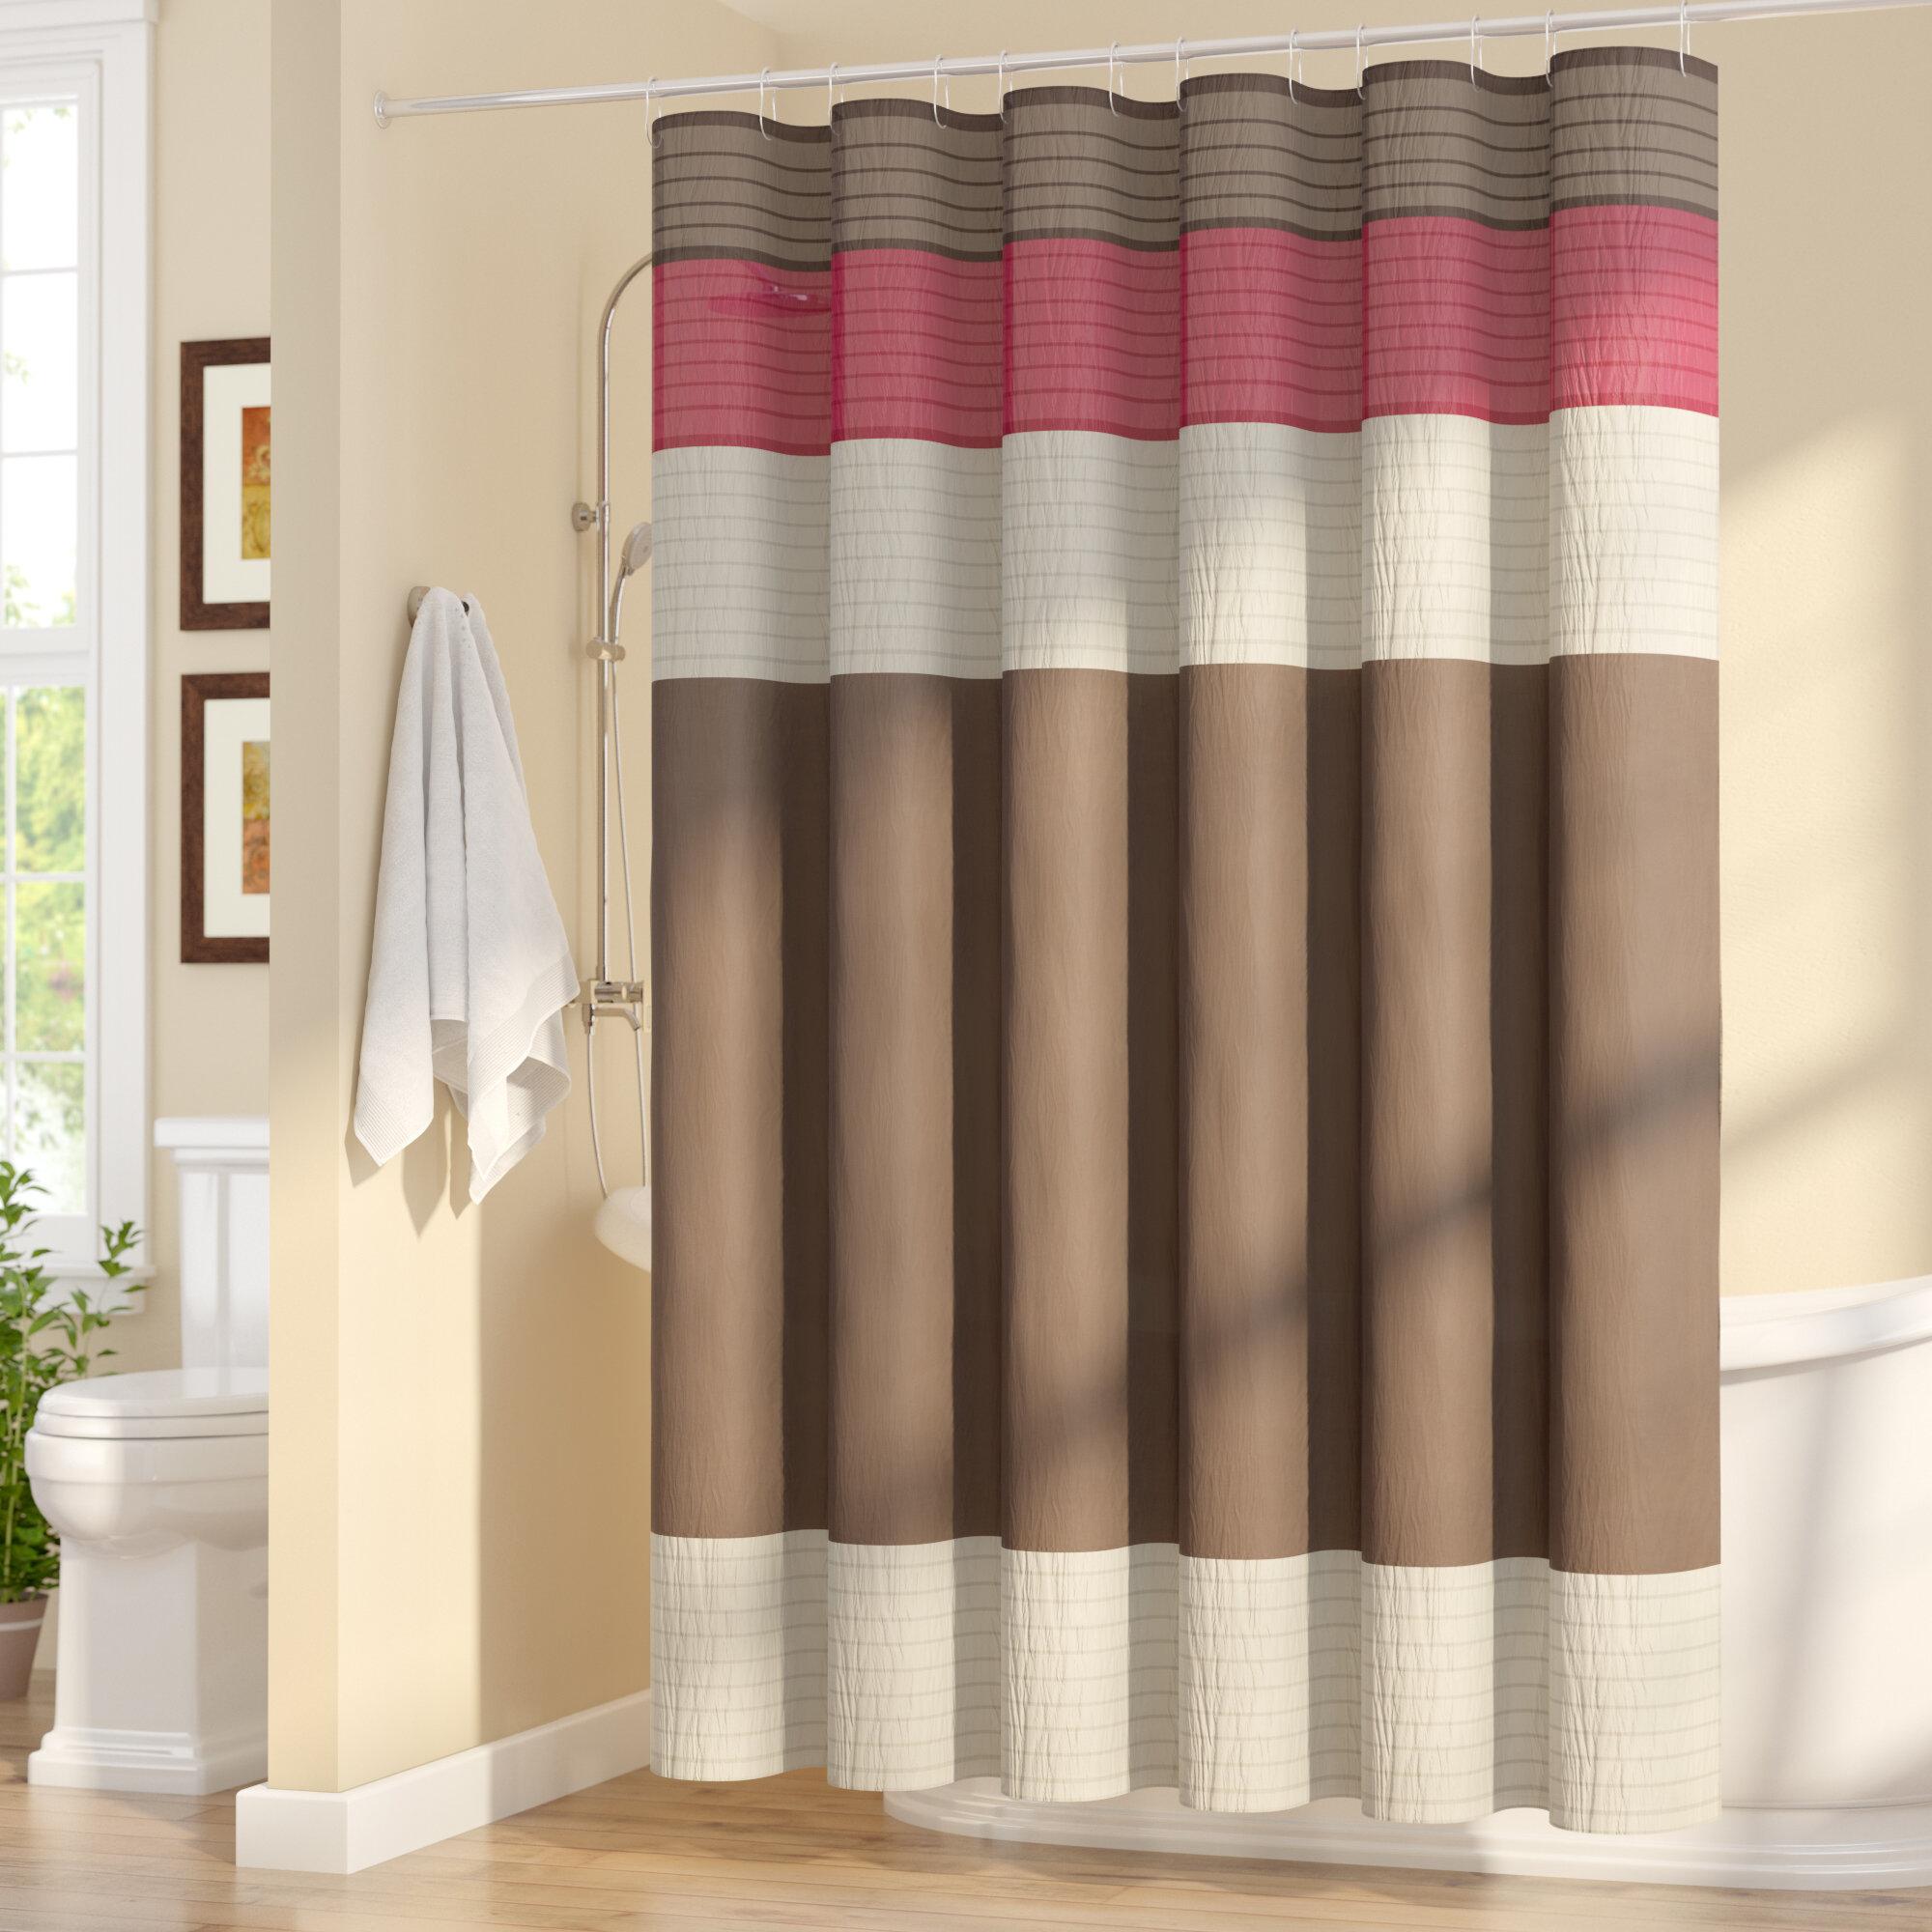 Three Posts Berardi Shower Curtain & Reviews | Wayfair.ca